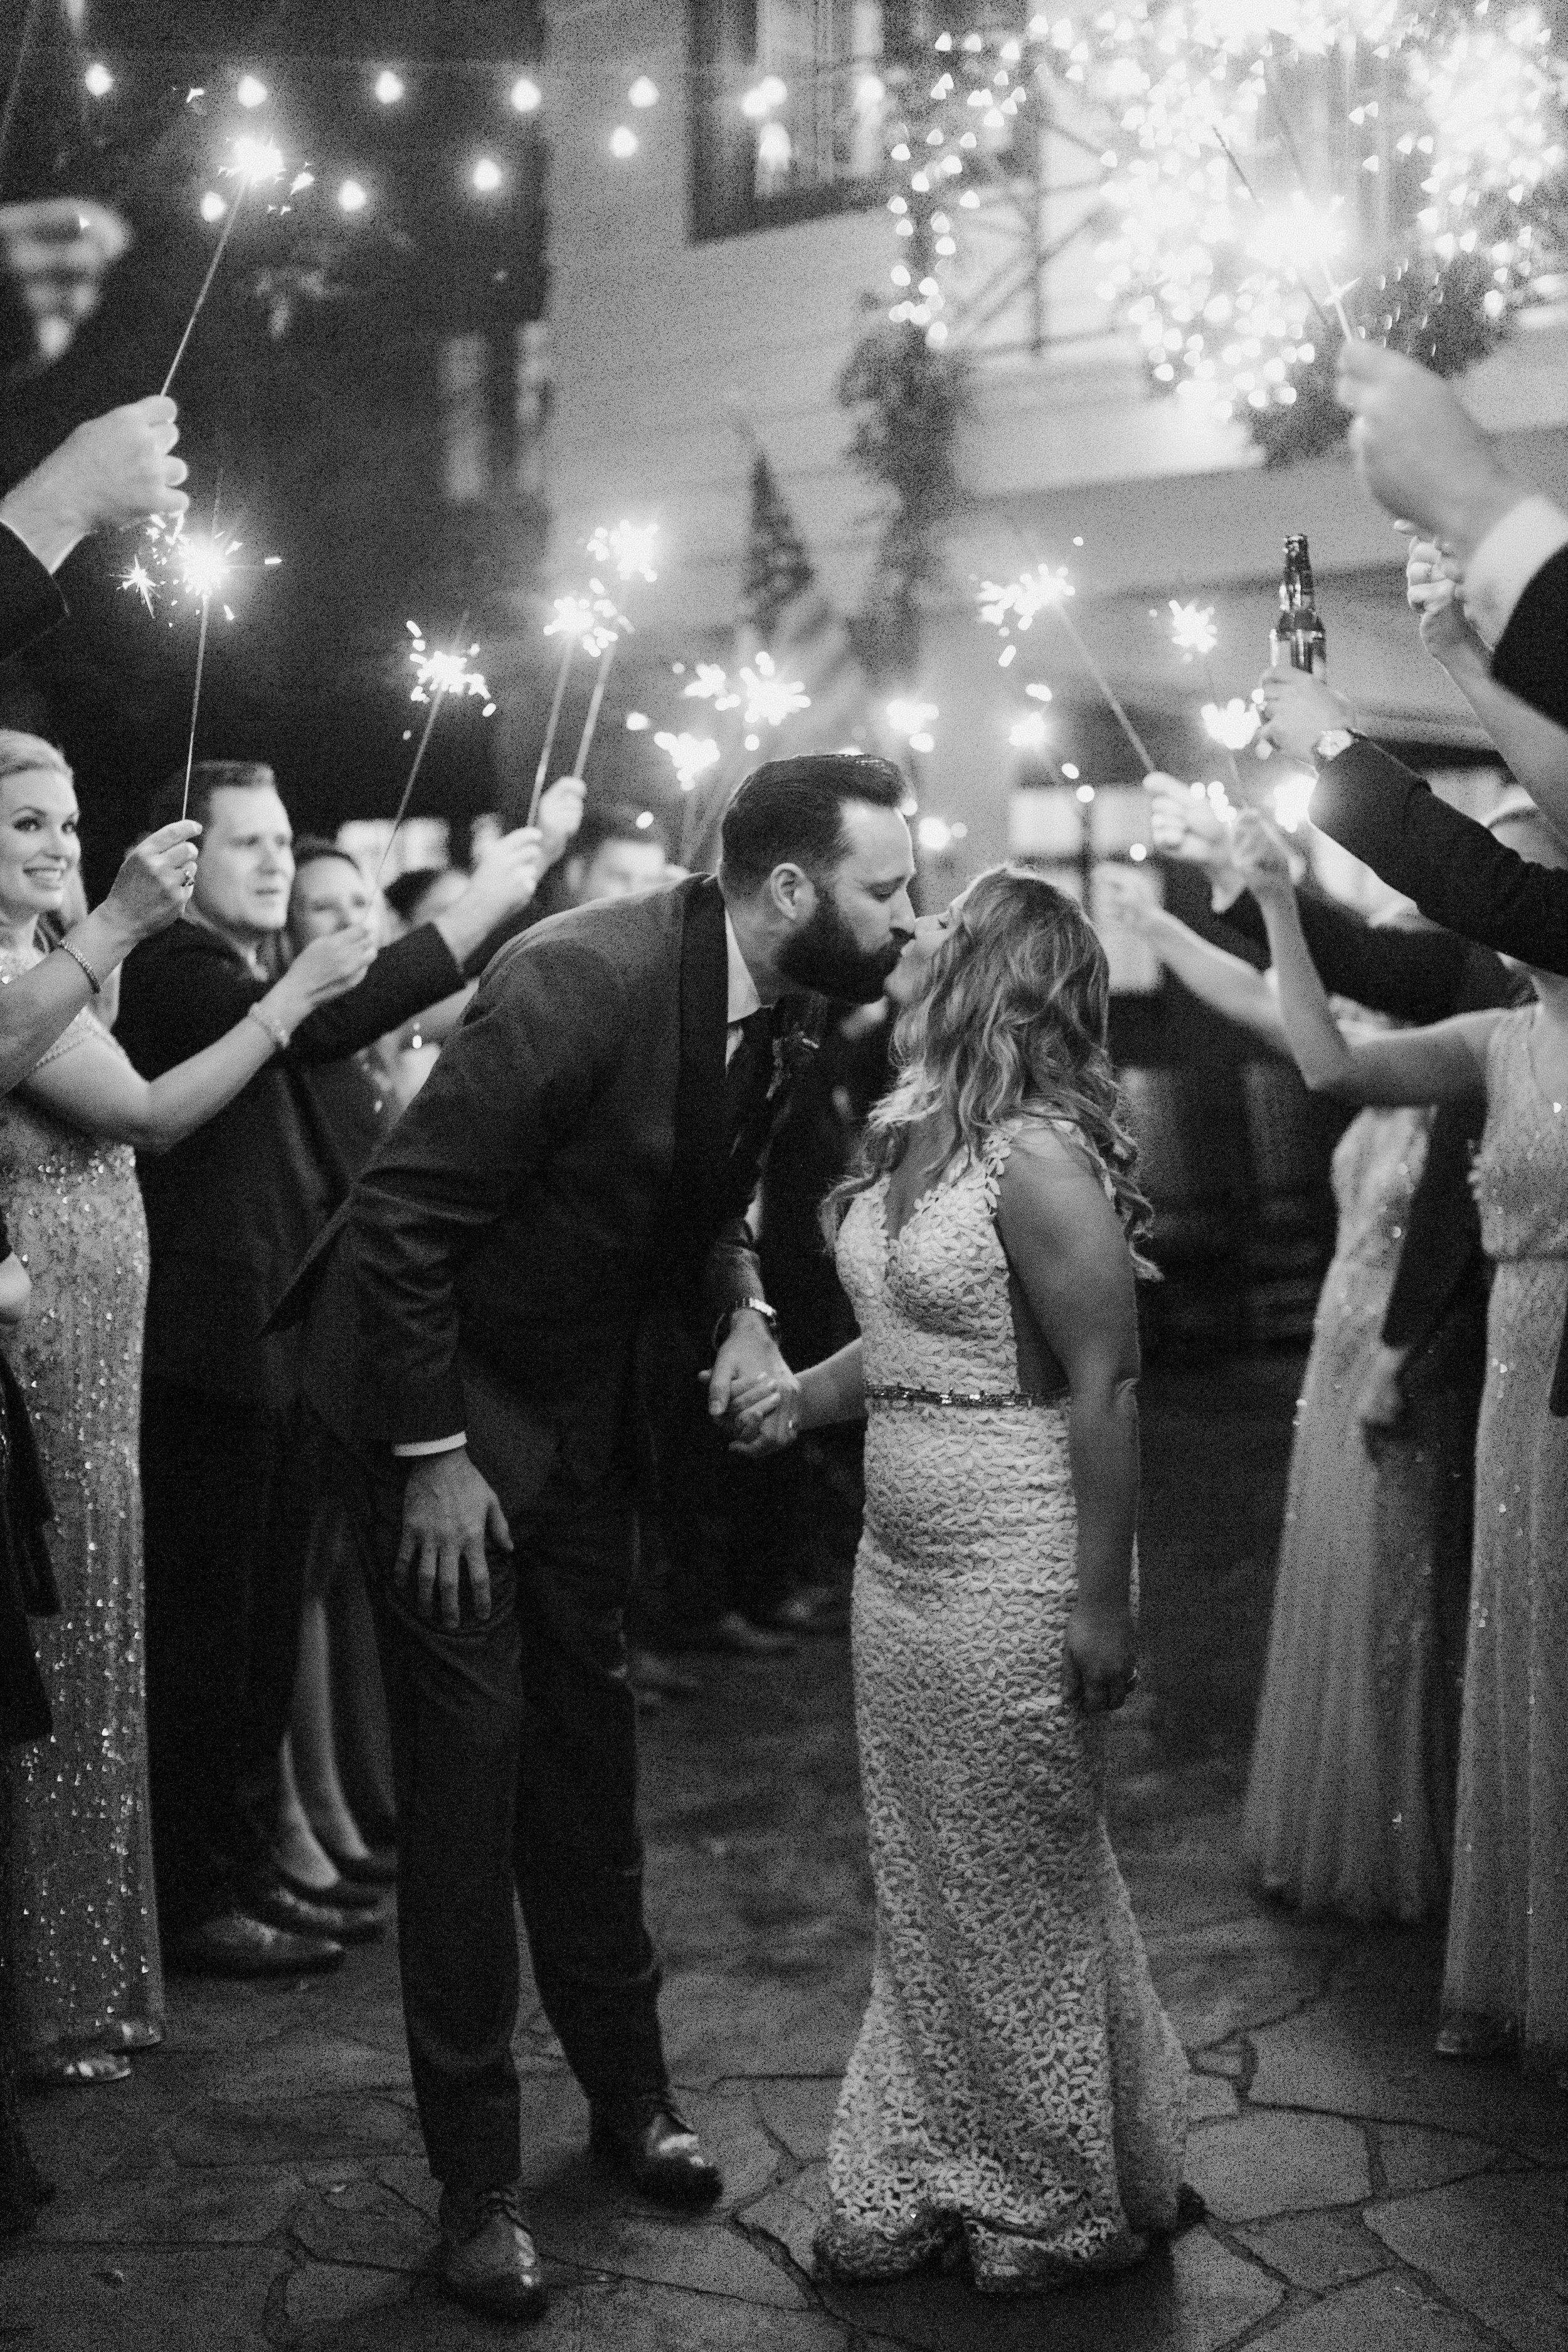 knoxville-wedding-photographer-253.JPG